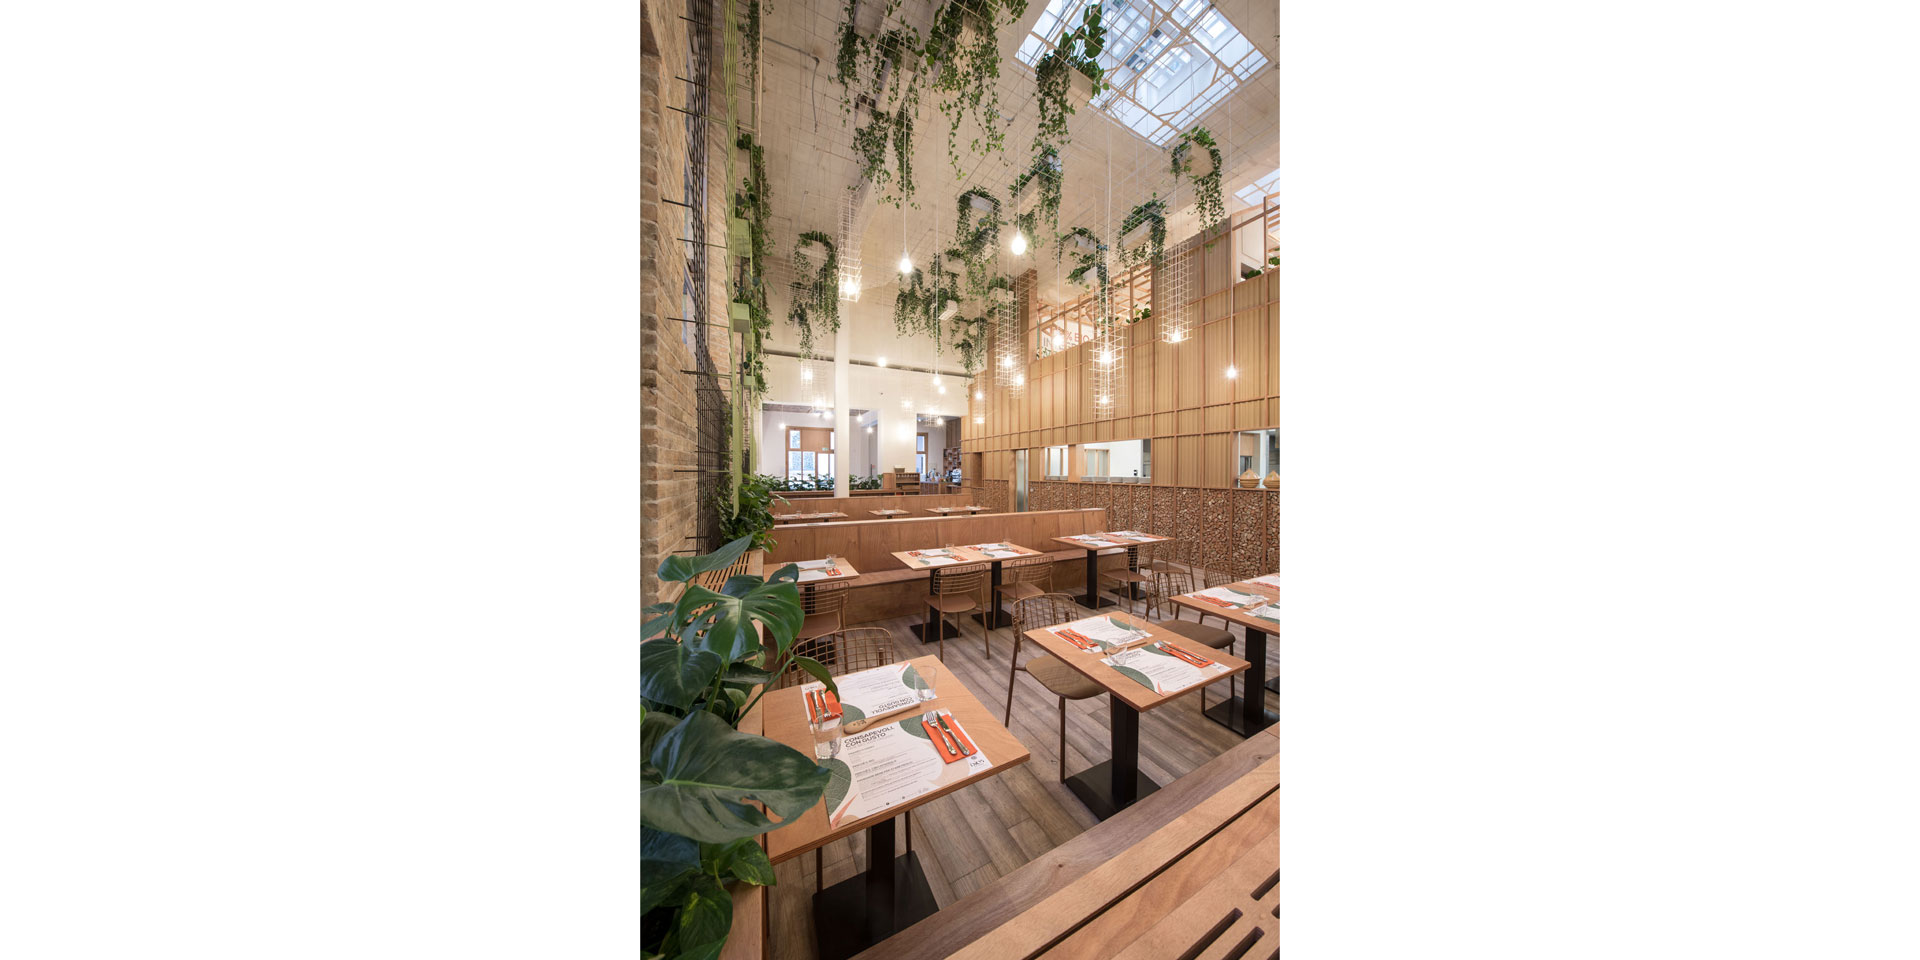 archinow_BOB_new-restaurant_14